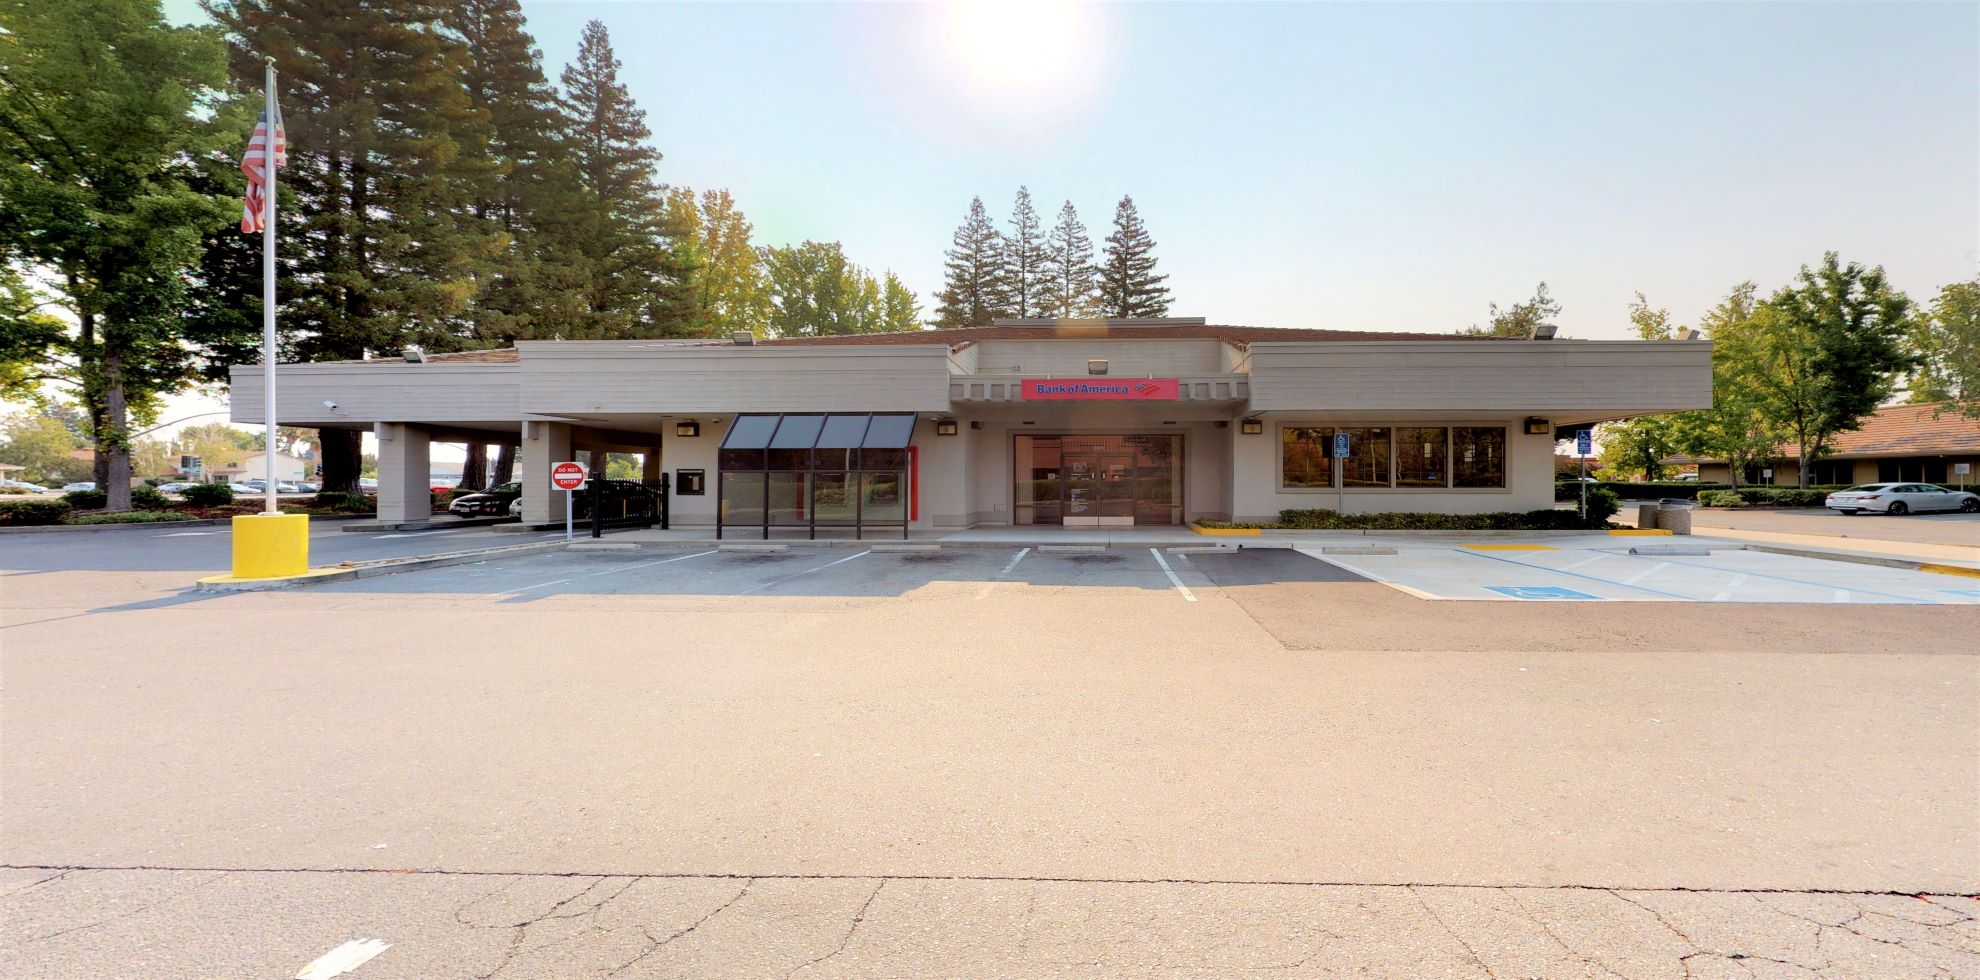 Bank of America financial center with drive-thru ATM | 940 Florin Rd, Sacramento, CA 95831